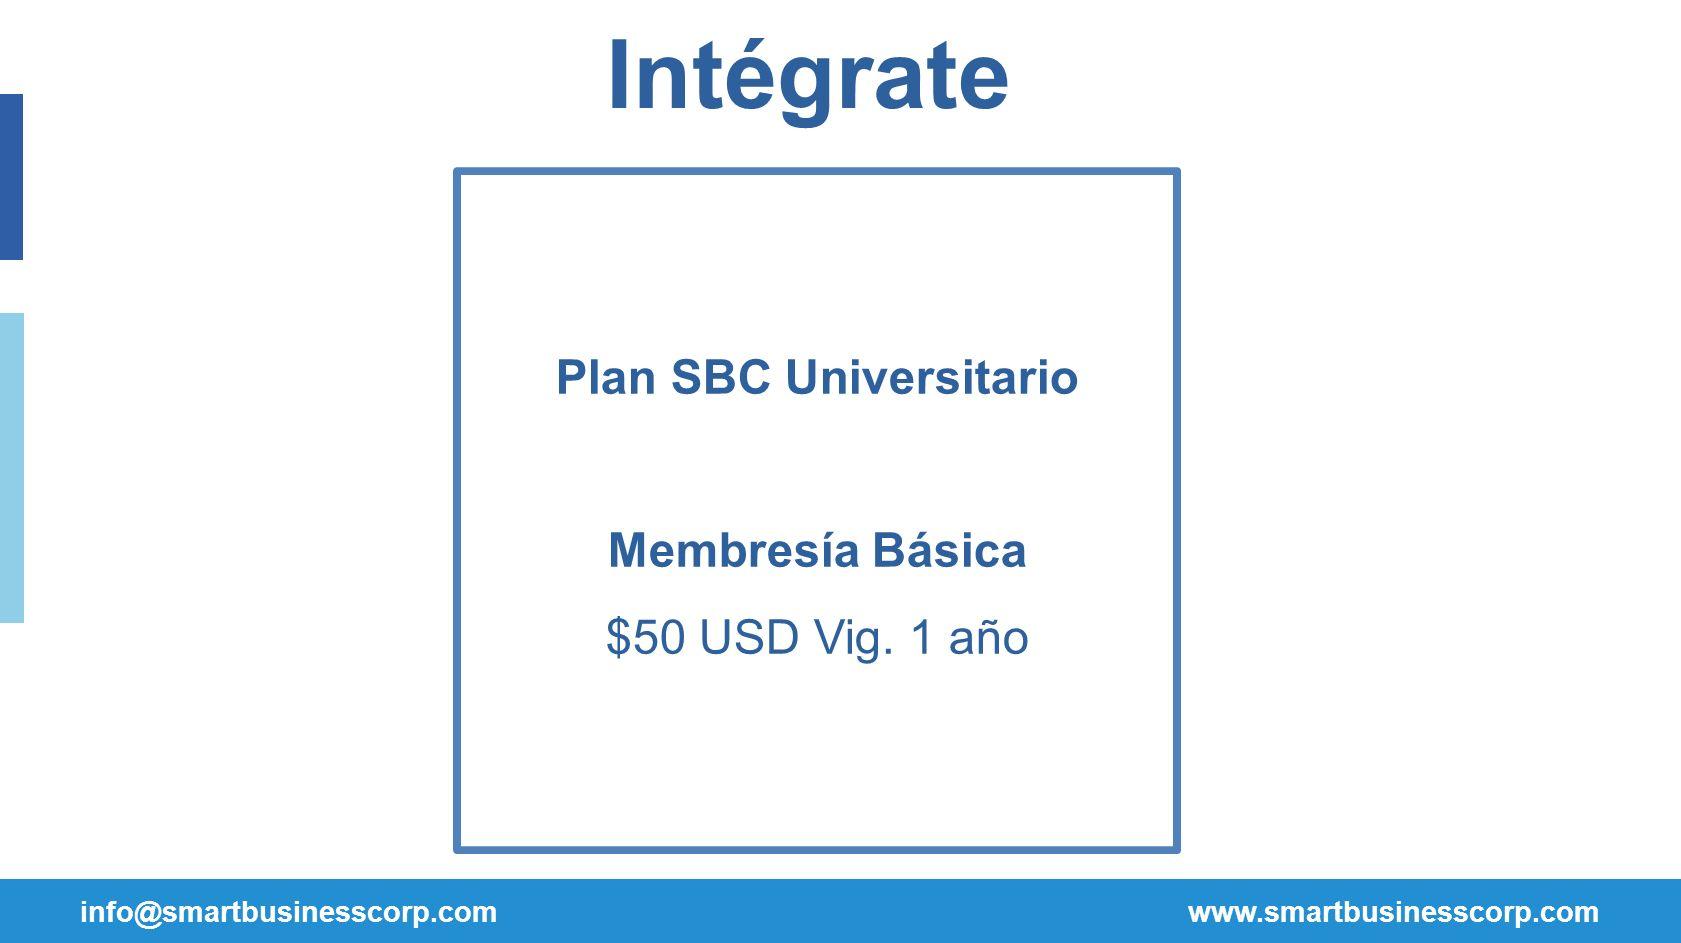 info@smartbusinesscorp.com www.smartbusinesscorp.com Intégrate Plan SBC Universitario Membresía Básica $50 USD Vig. 1 año